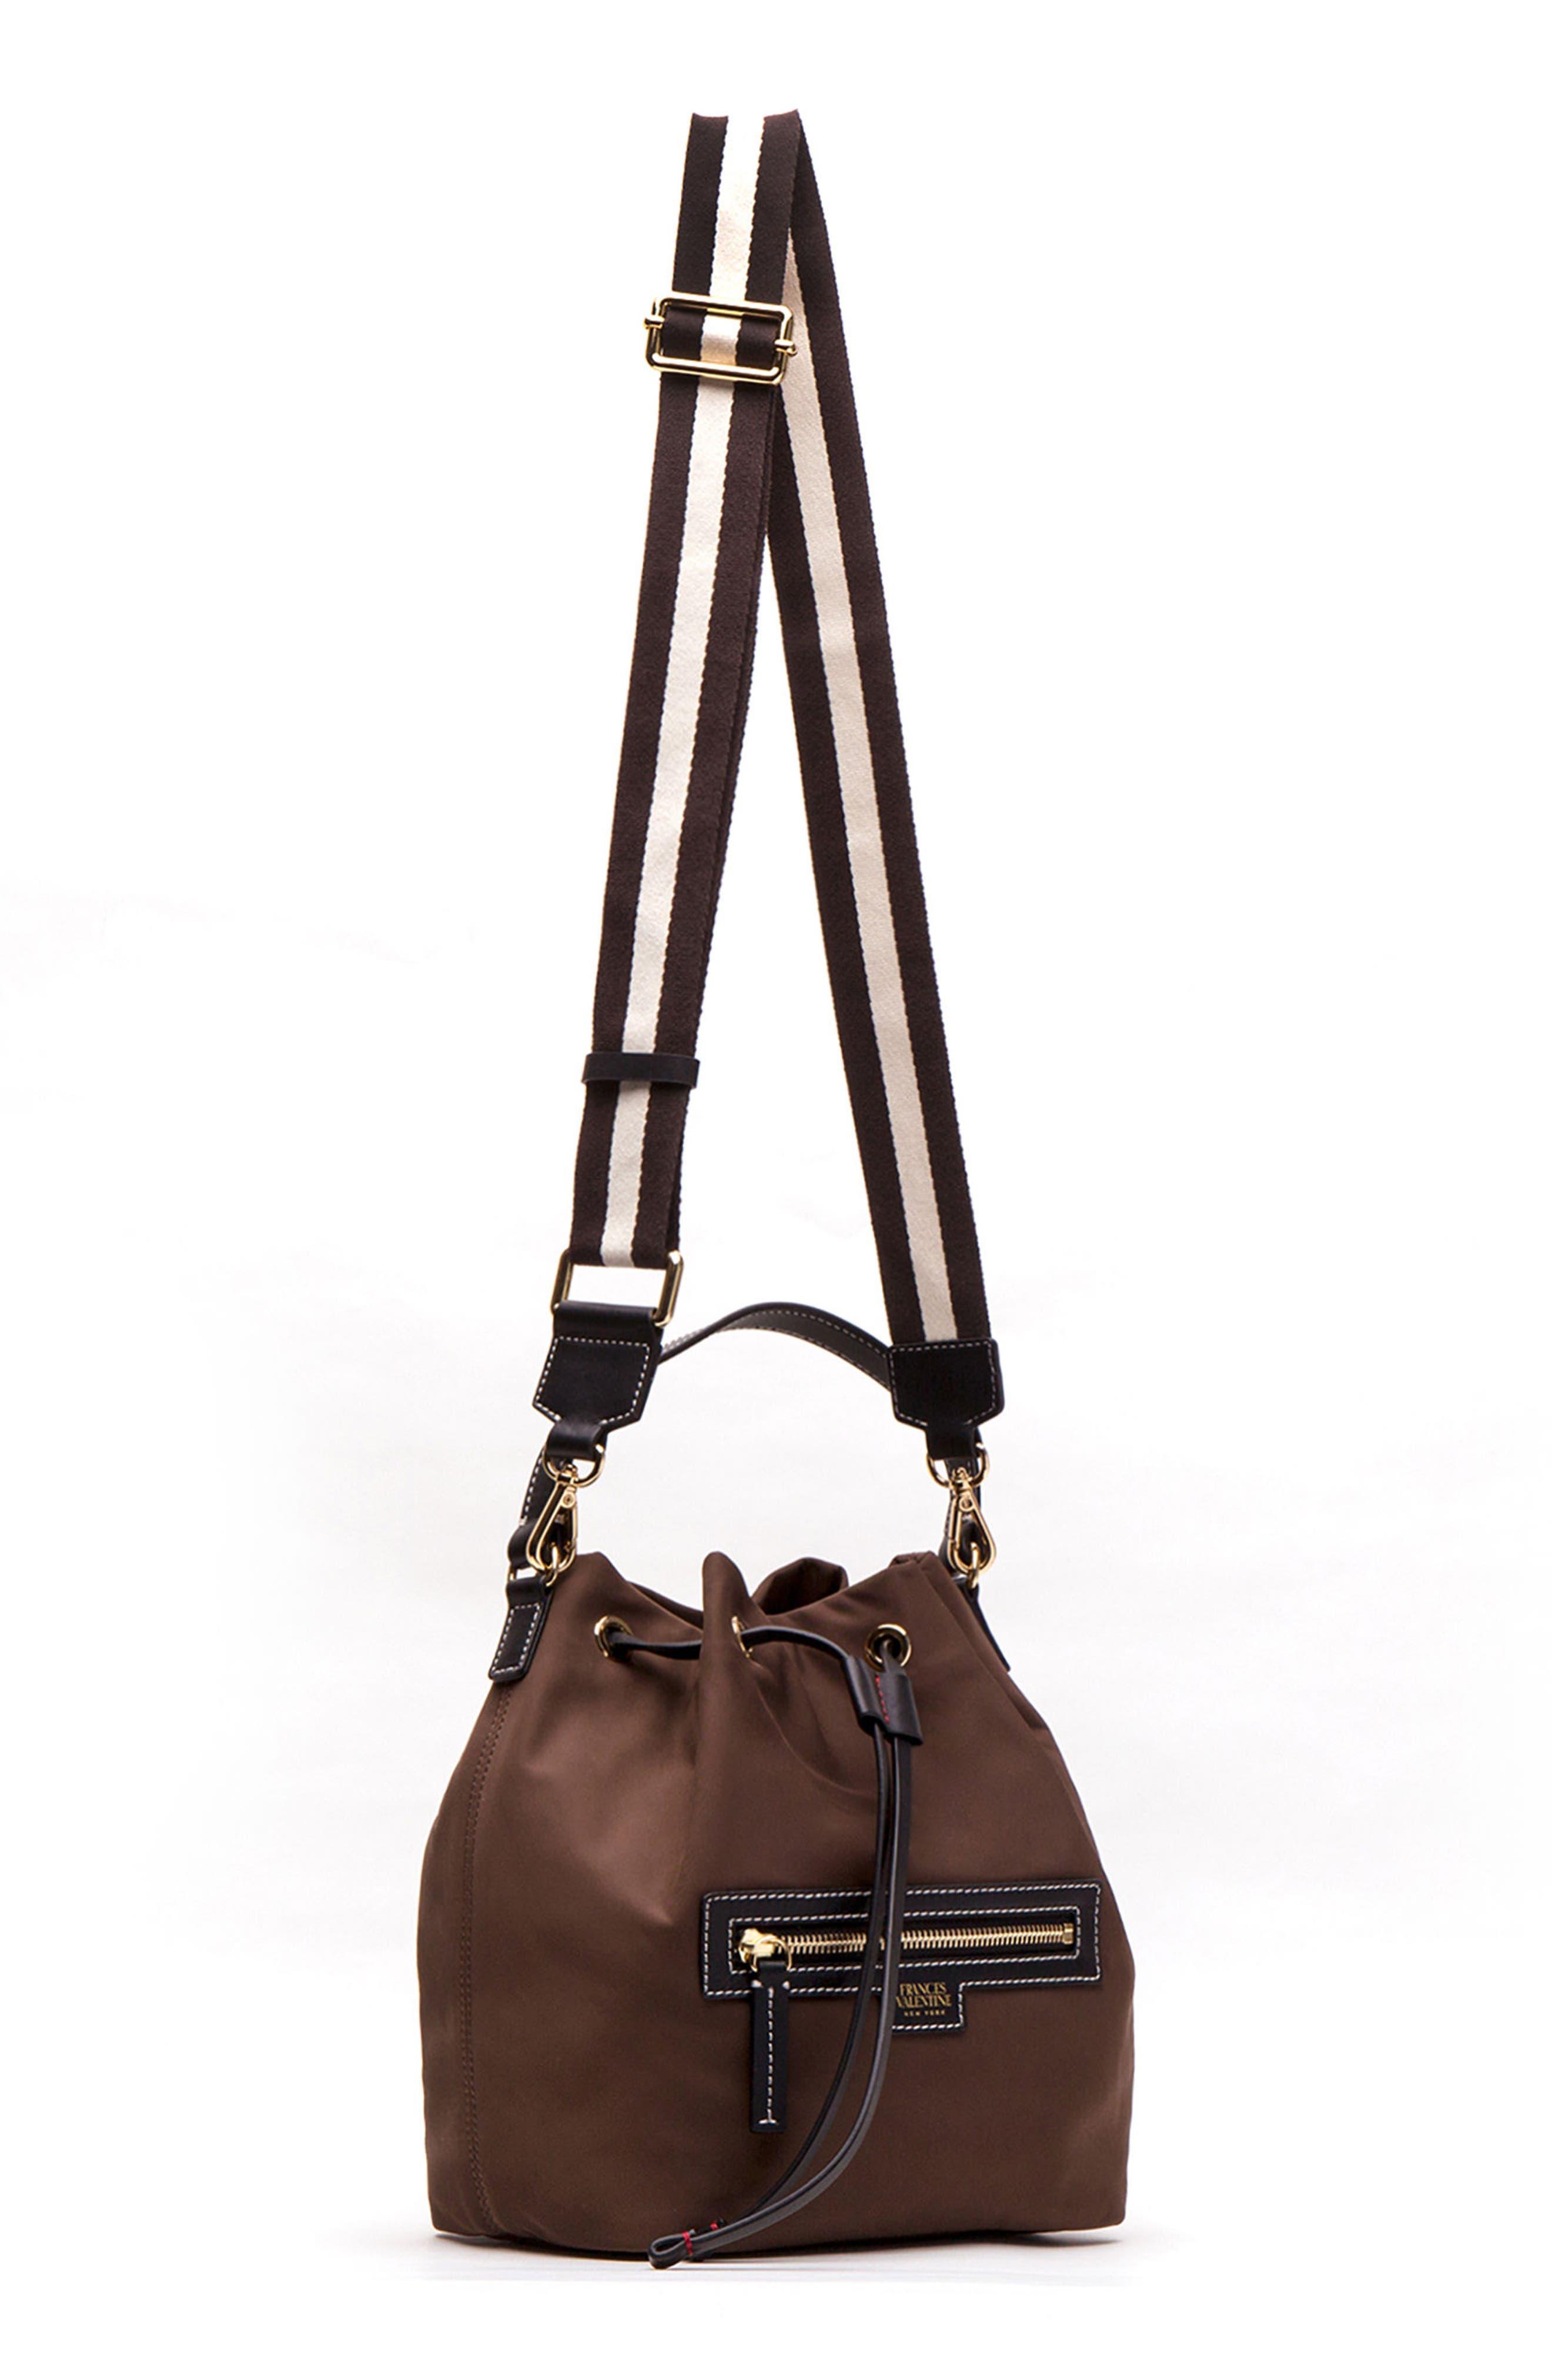 Medium Ann Nylon Bucket Bag,                             Alternate thumbnail 14, color,